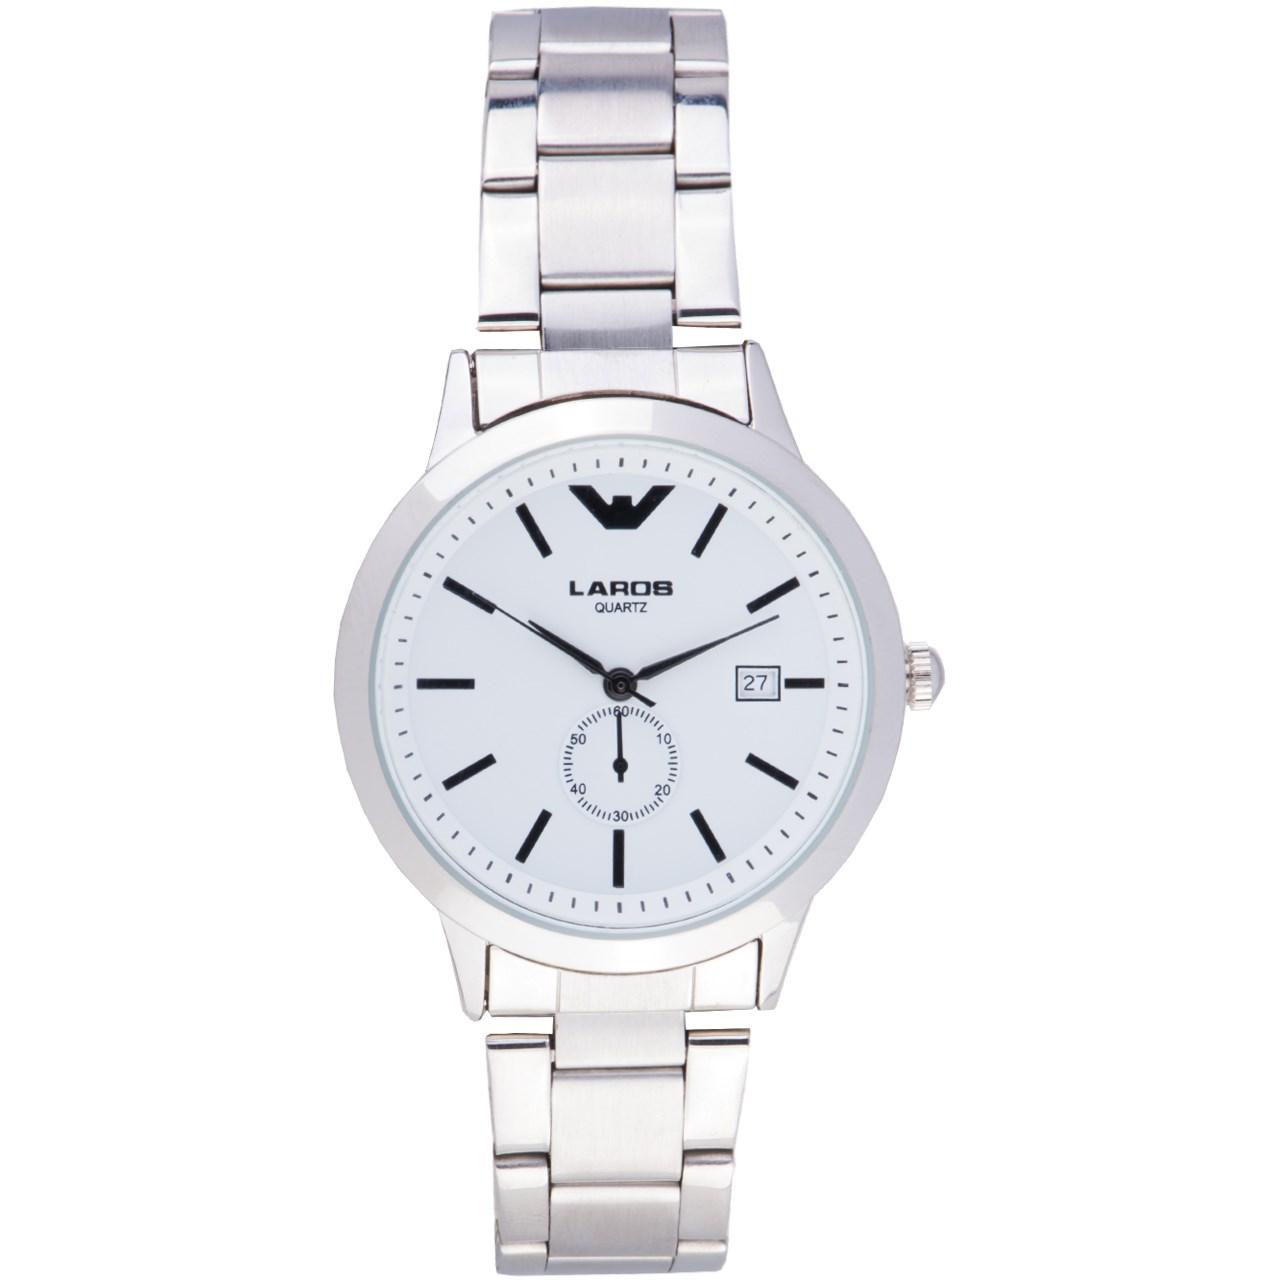 ساعت مچی عقربه ای مردانه لاروس مدل 79965D 38